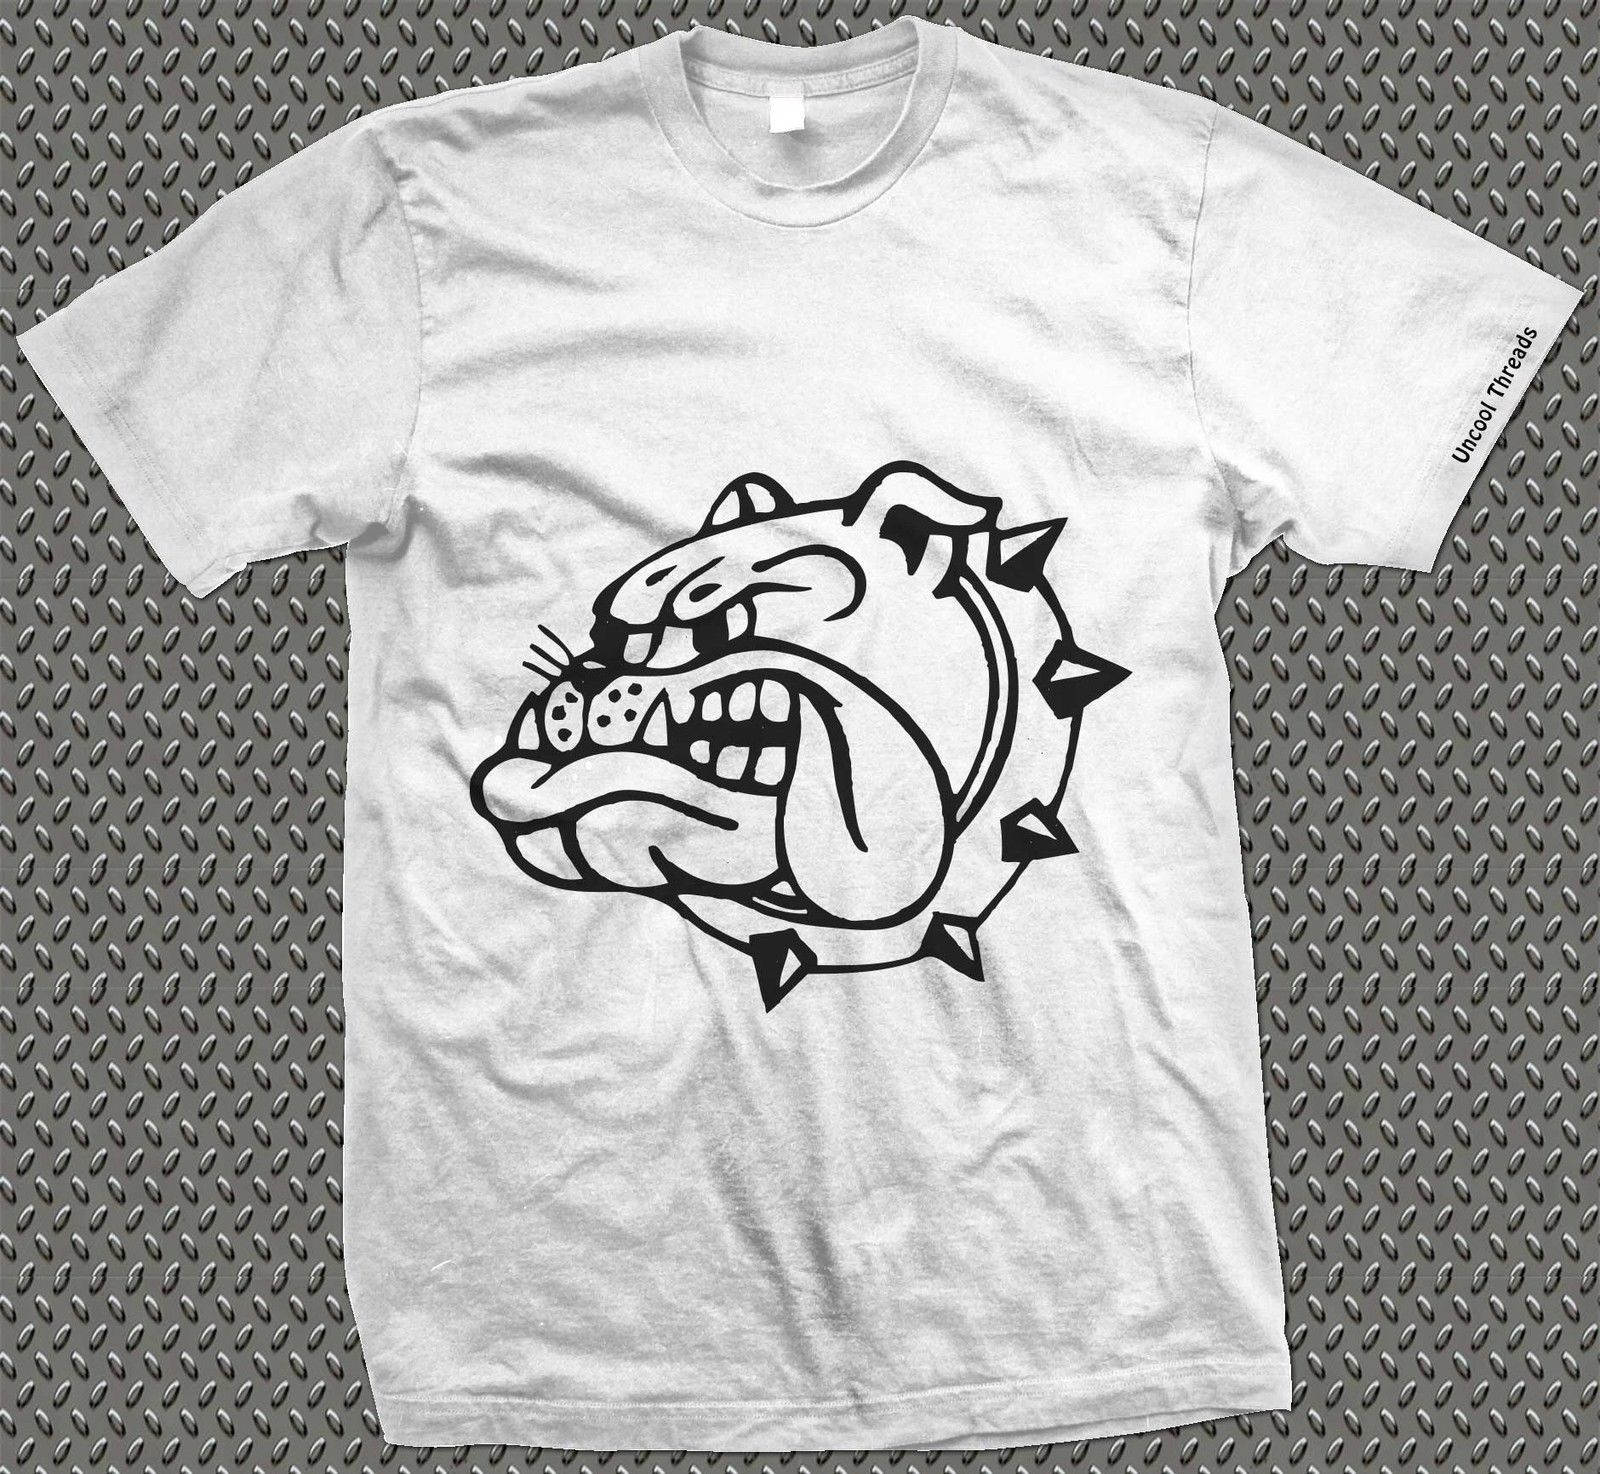 BULLDOG Design Printed T-Shirt - Spike Tyke Butch Animal Dog Grafitti Cool Casual pride t shirt men Unisex New Fashion tshirt